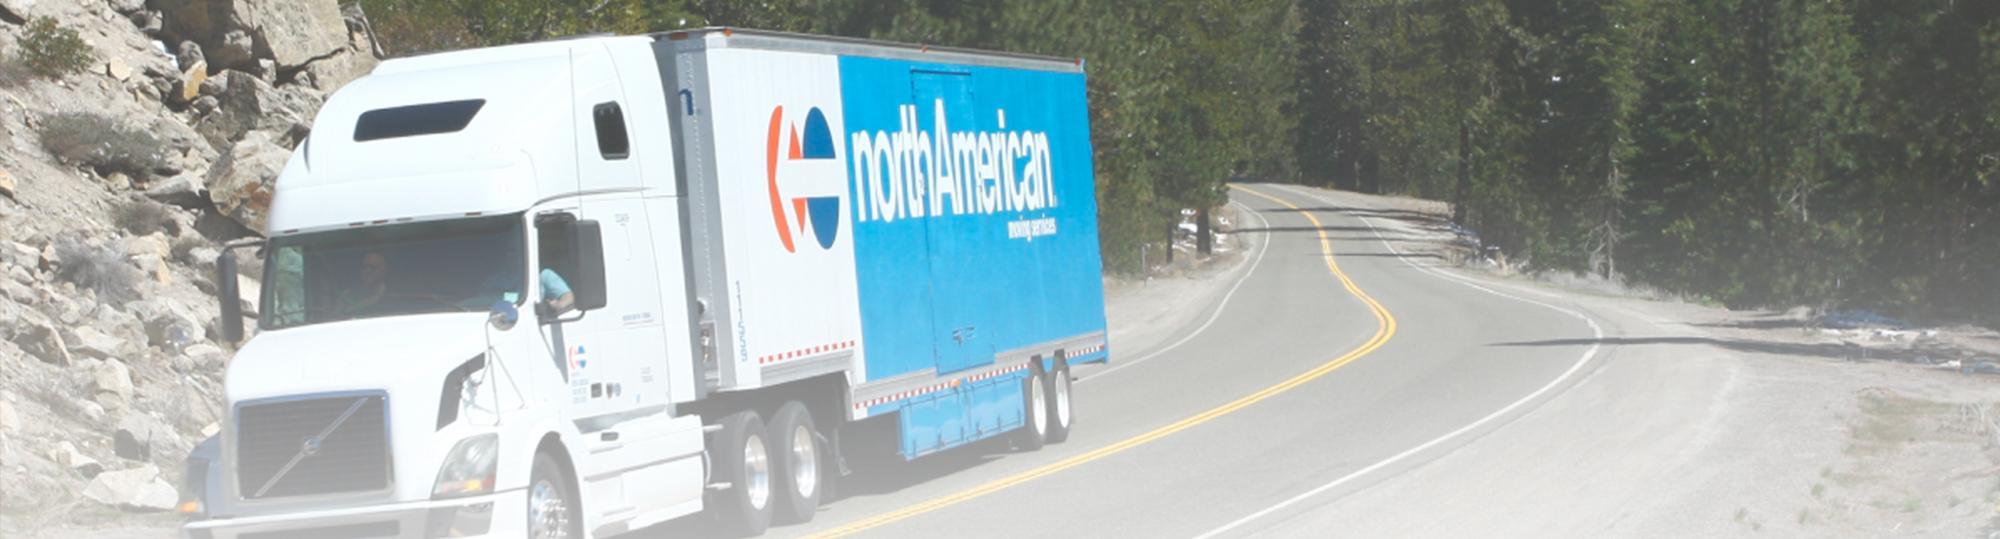 north american van lines partner hero